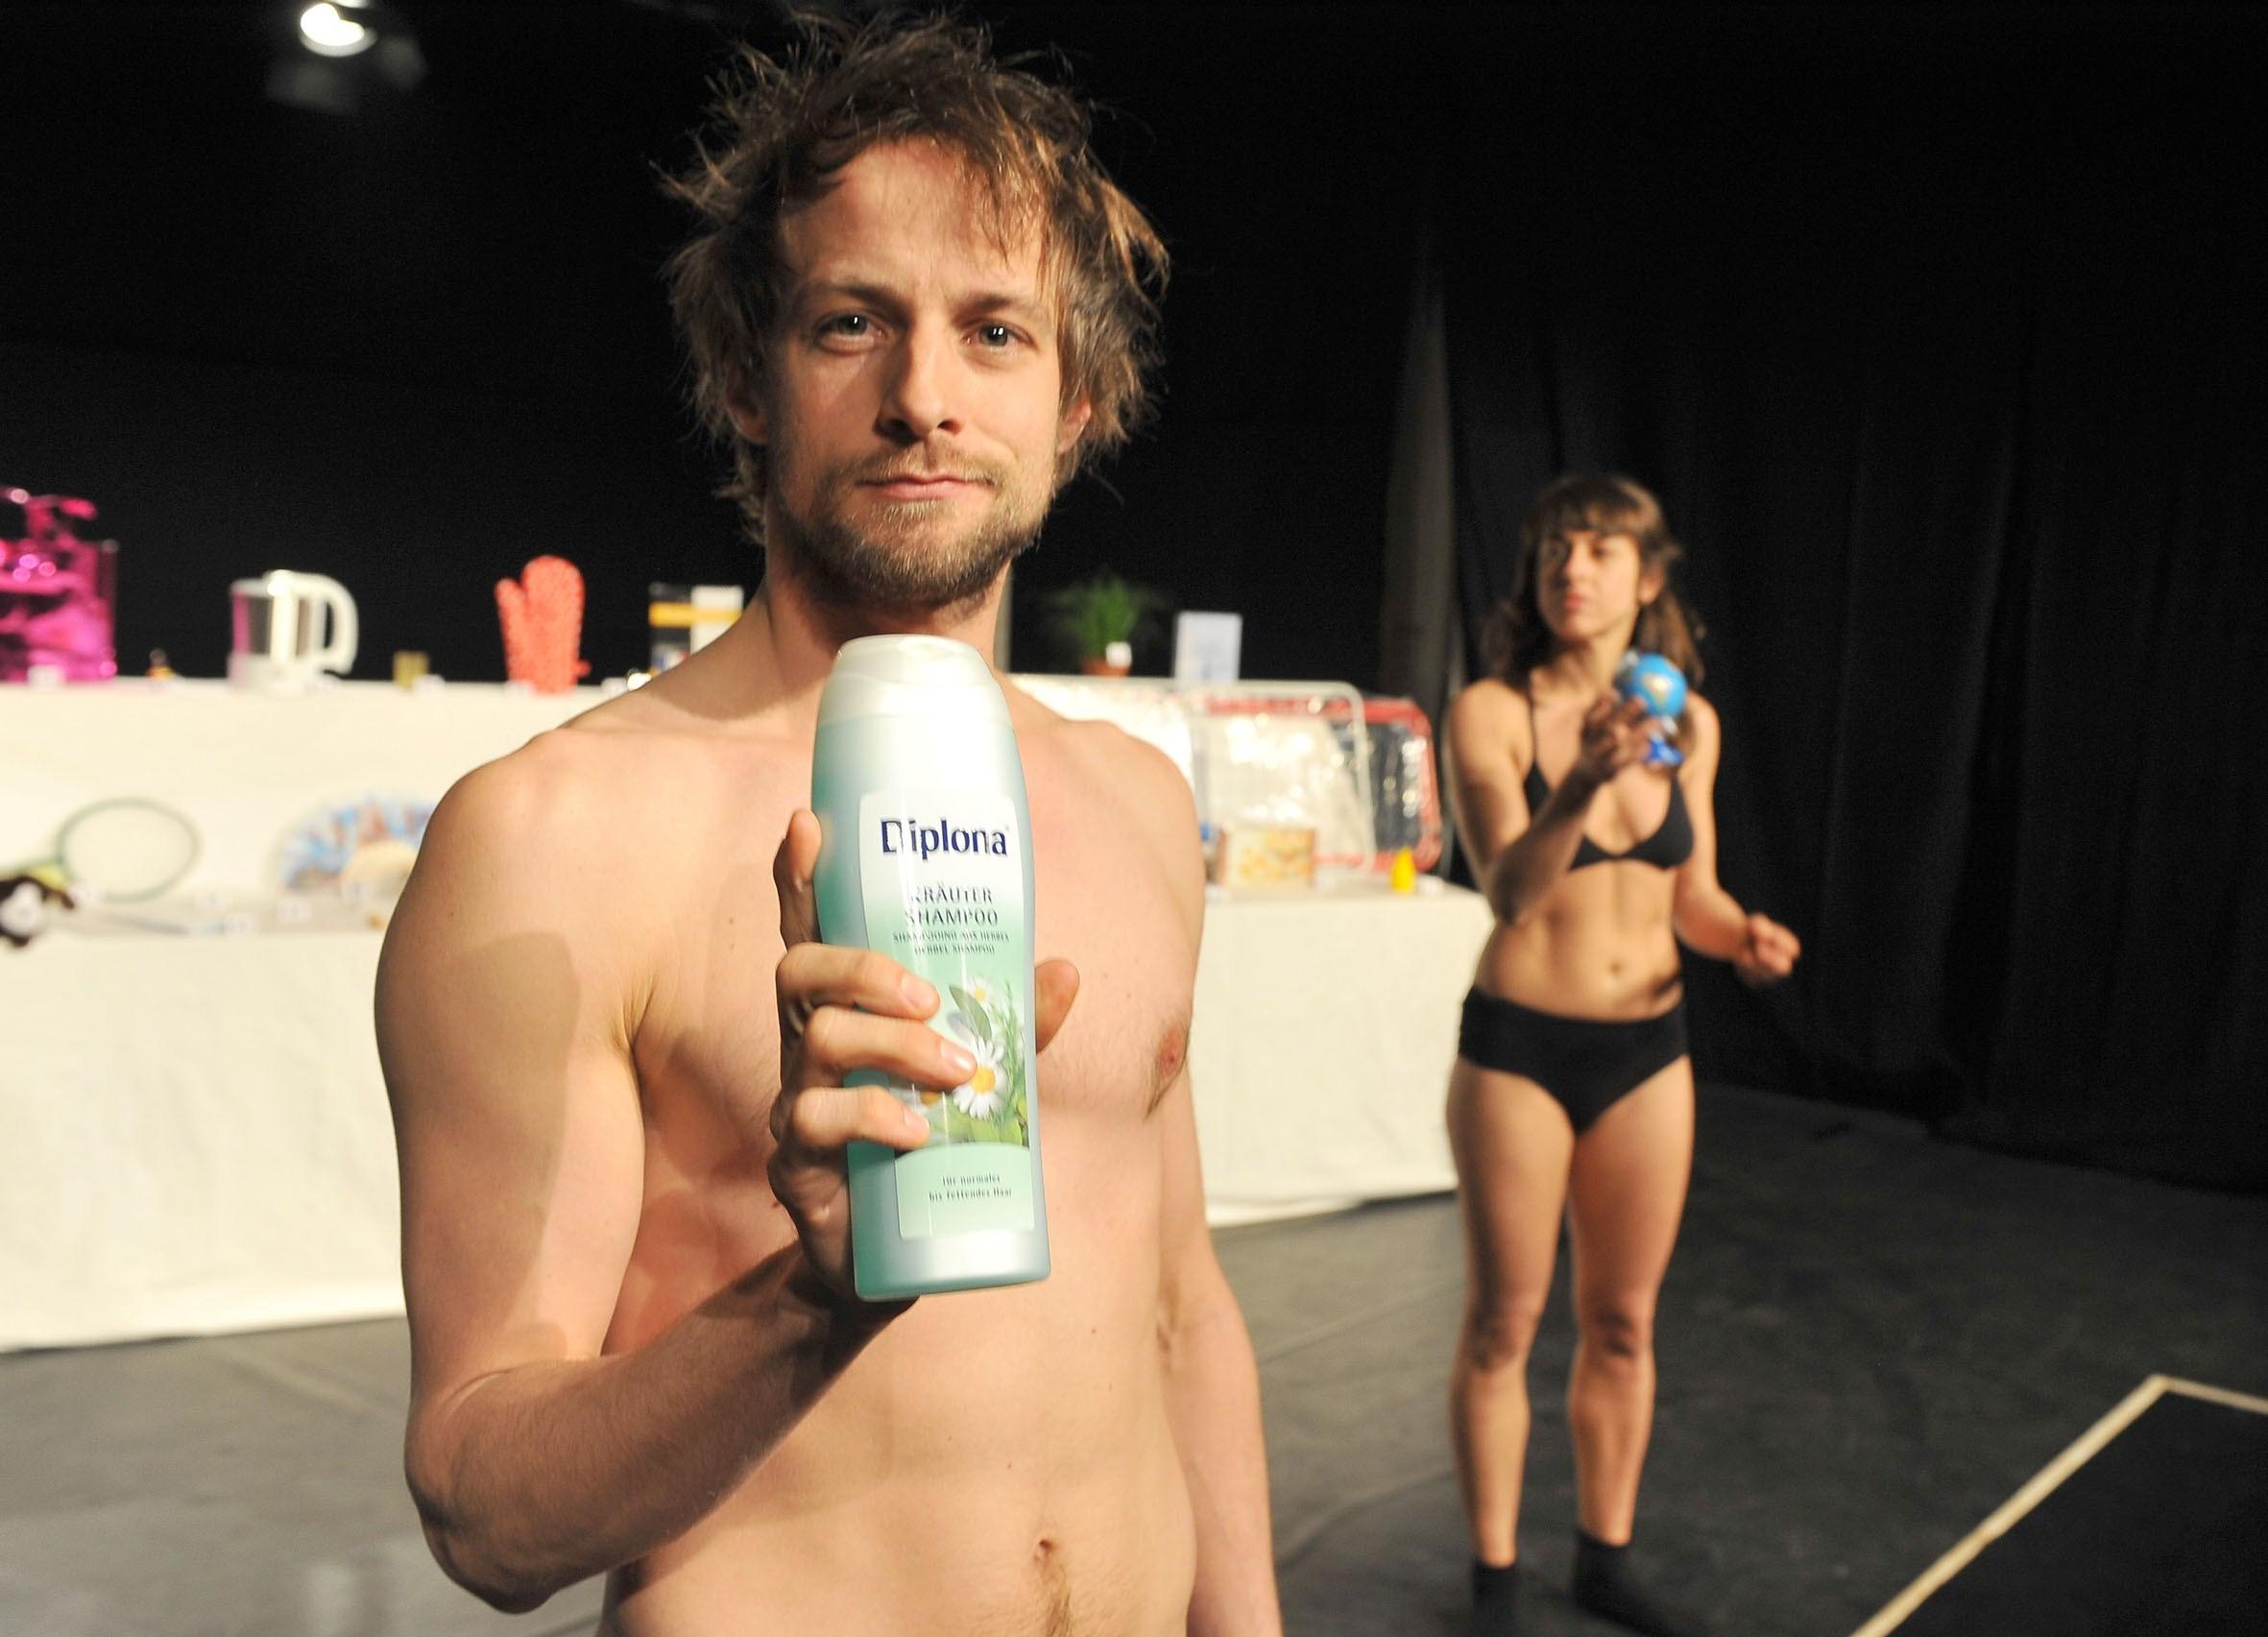 Freischwimmer_Festival_Kalauz&Schick_ CMMN SNS PRJCT